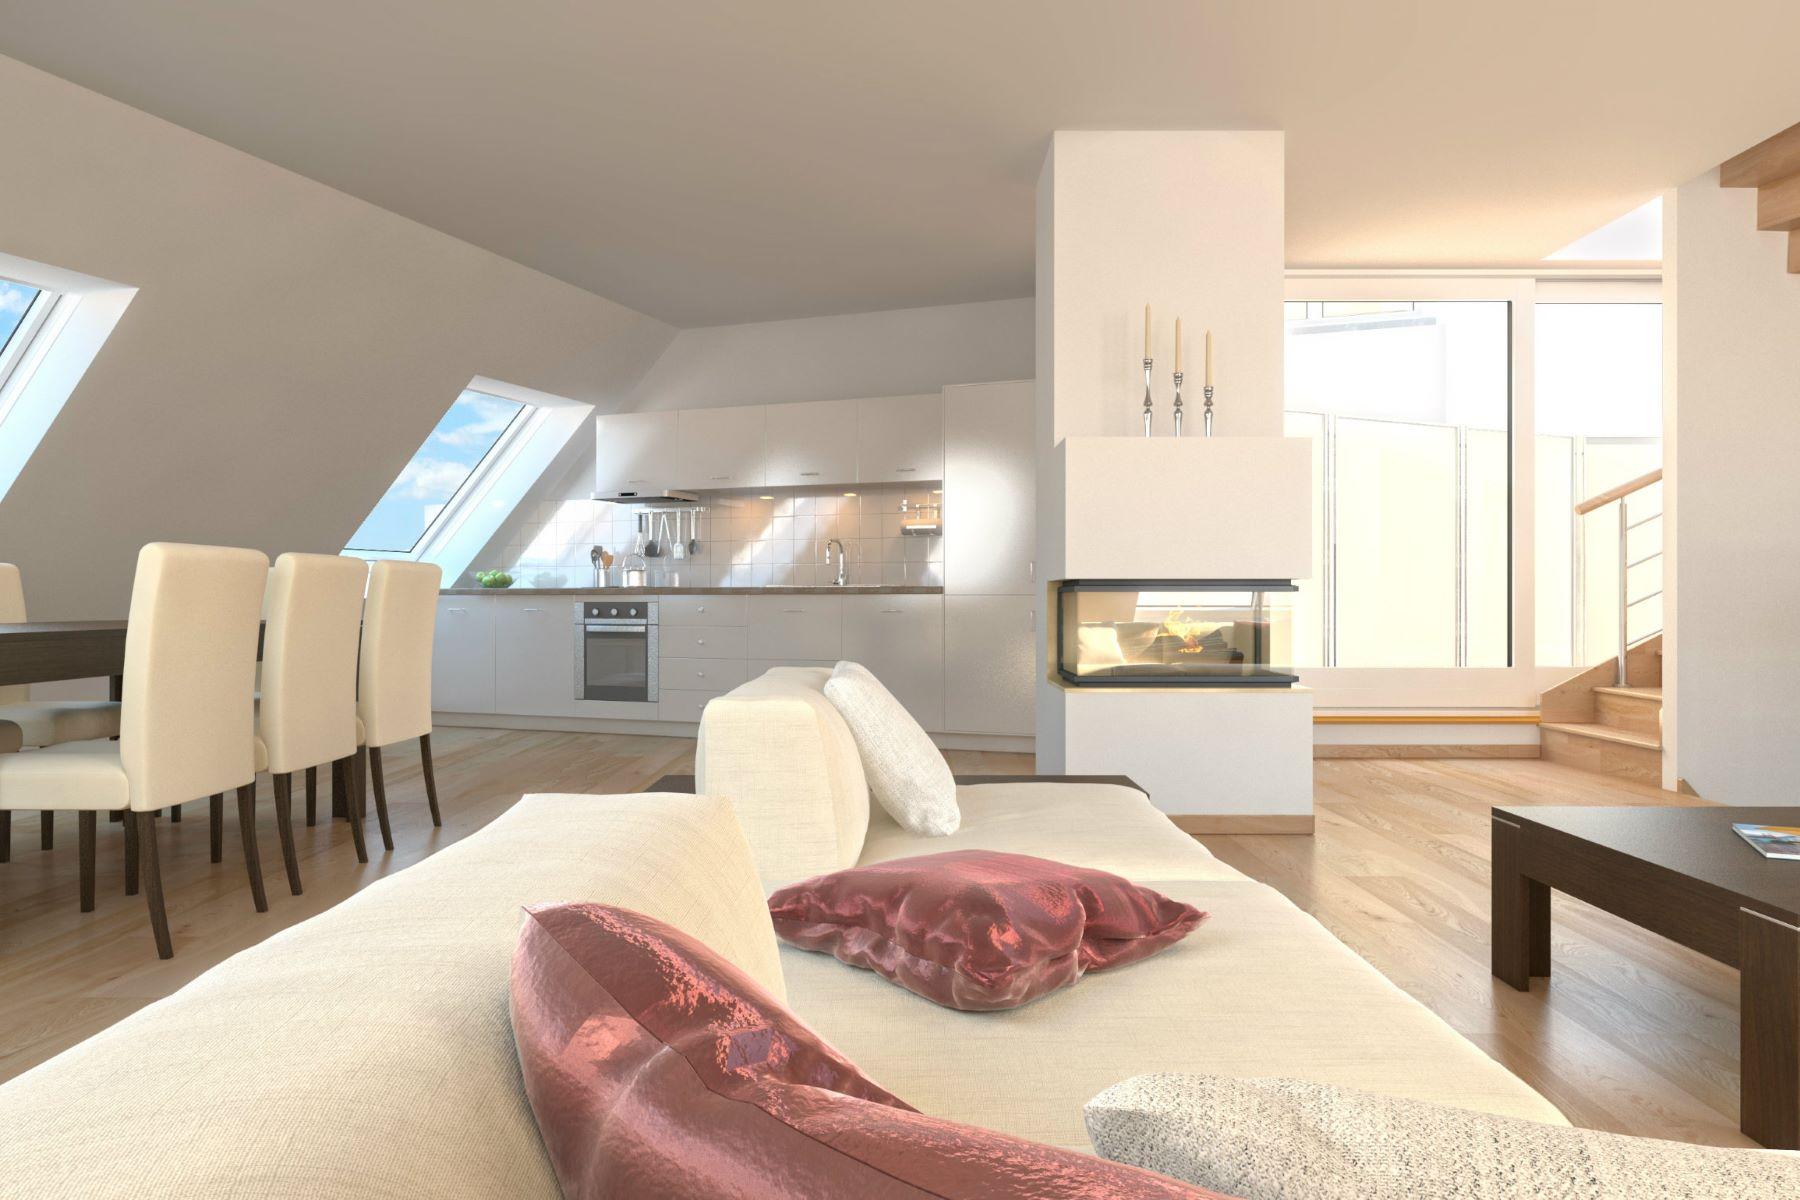 Квартира для того Продажа на BEAUTIFUL 3 BED PENTHOUSE Vienna, Cities In Austria, 1090 Austria